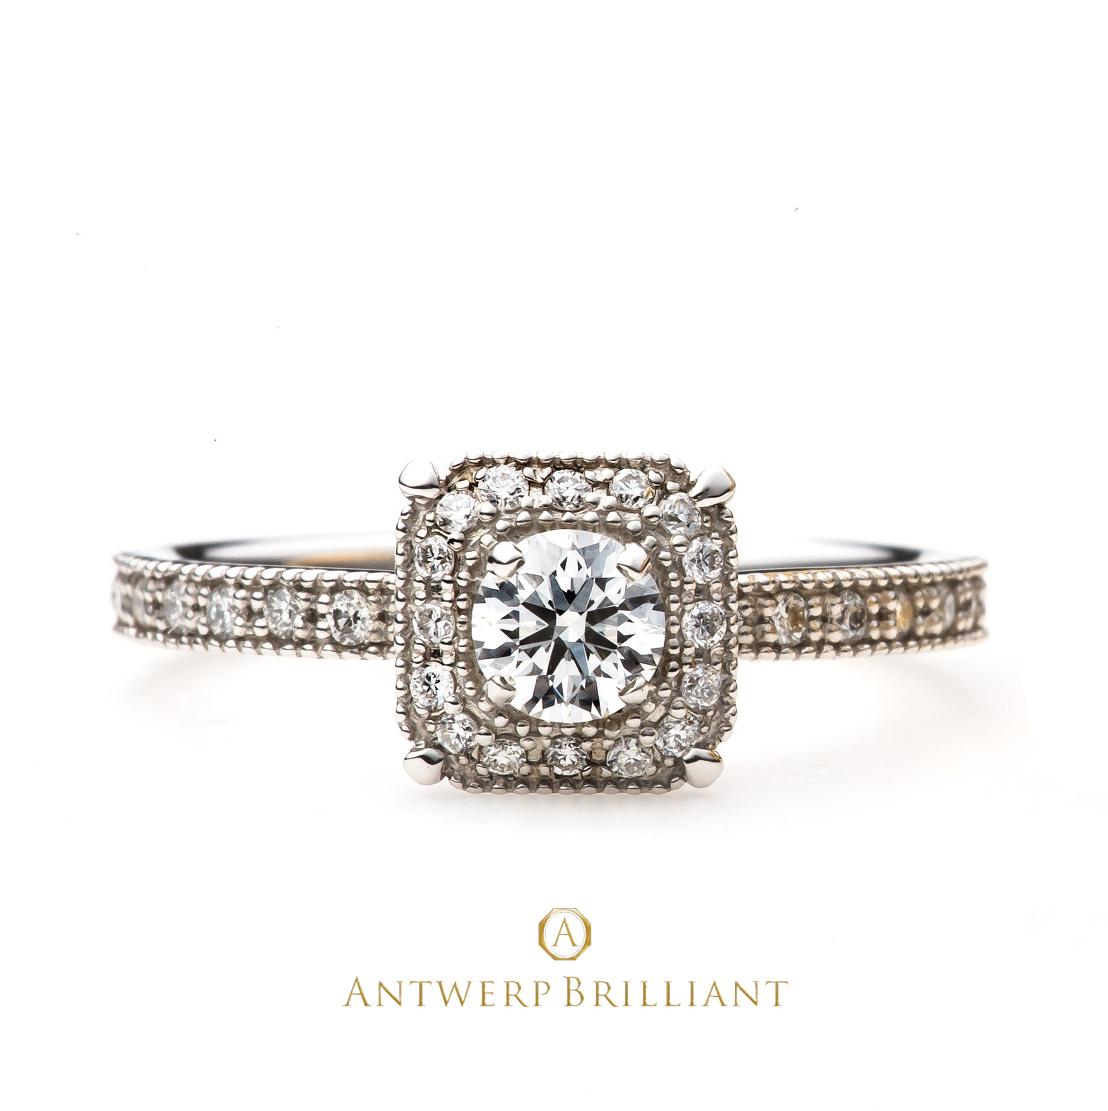 BELGIUMブルージュ ダイヤモンド婚約リング アンティークミルが人気の豪華なエンゲージ